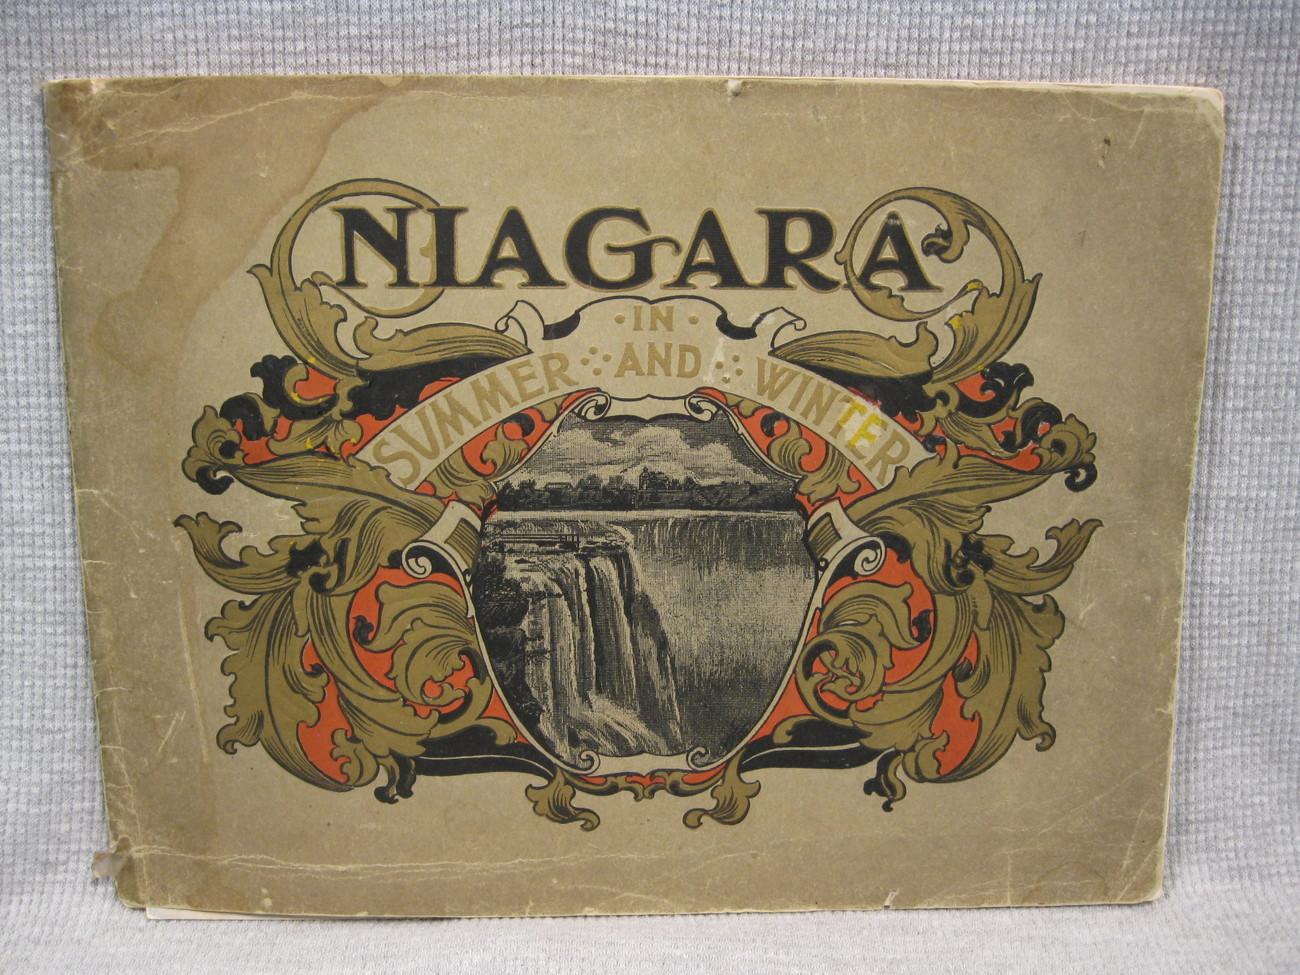 Niagara Falls in Summer and Winter